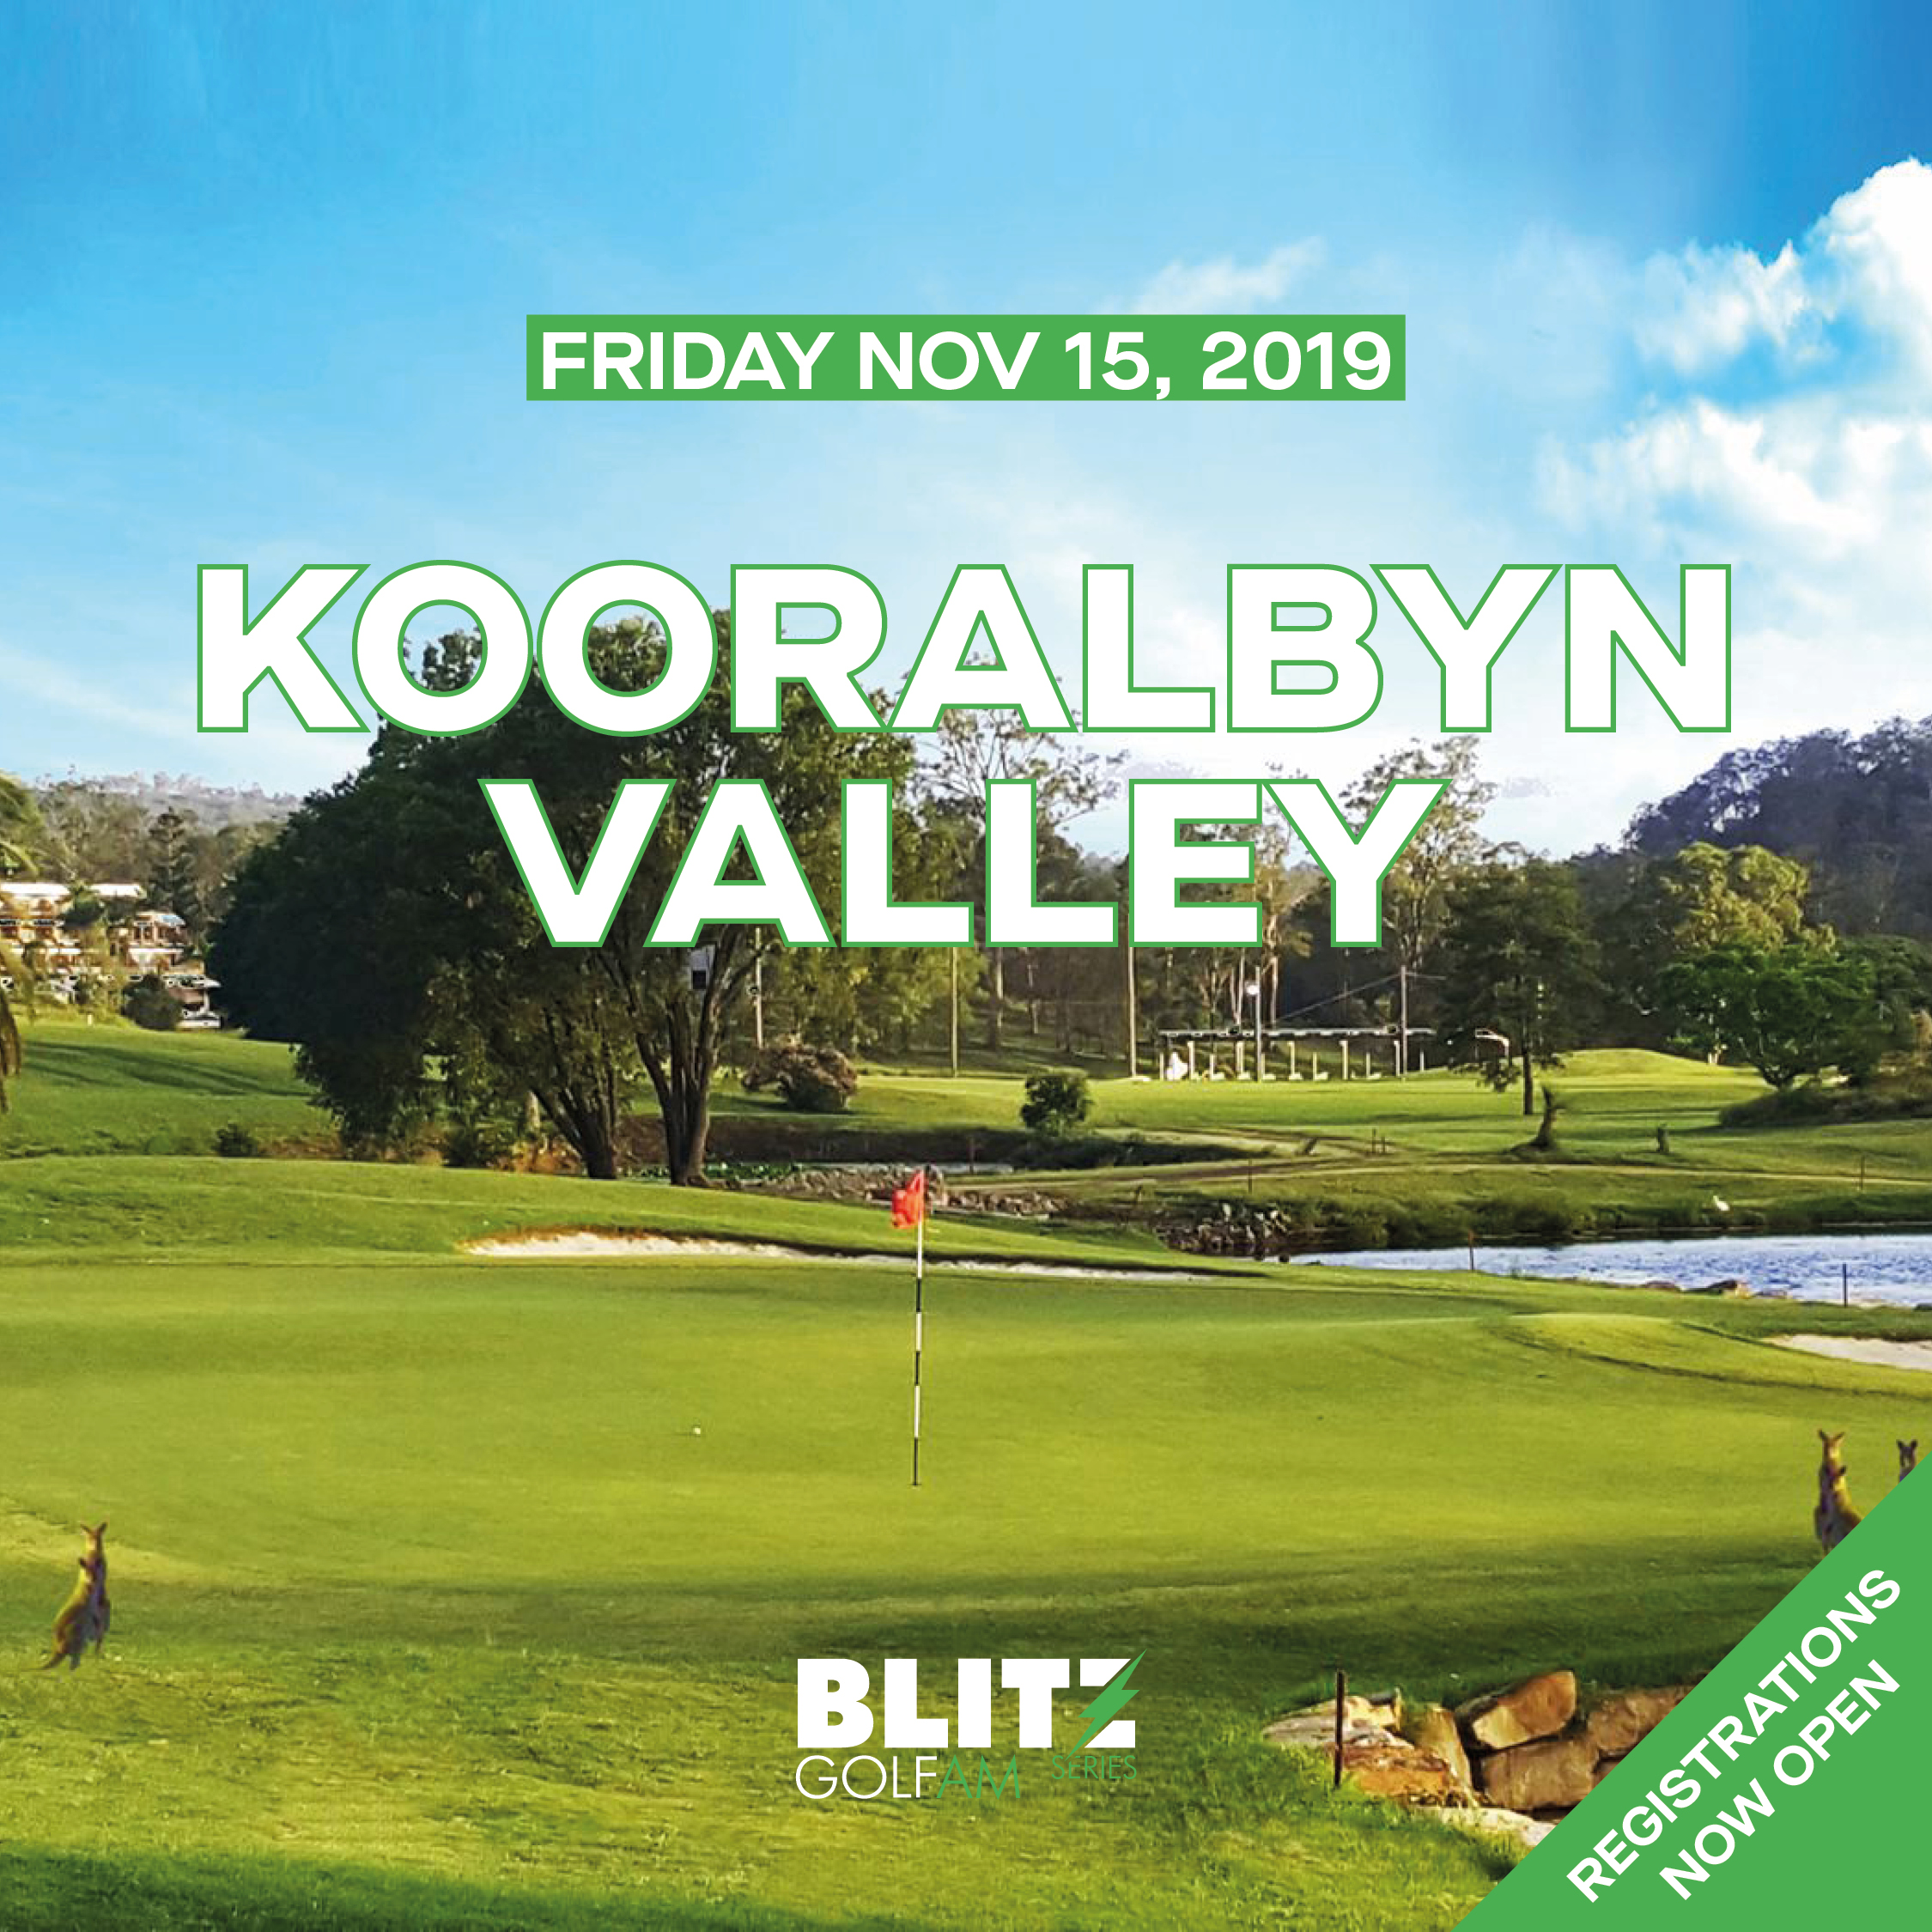 QLD_Kooralbyn Valley_Blitz 2020_AM Series Launch_151119.jpg